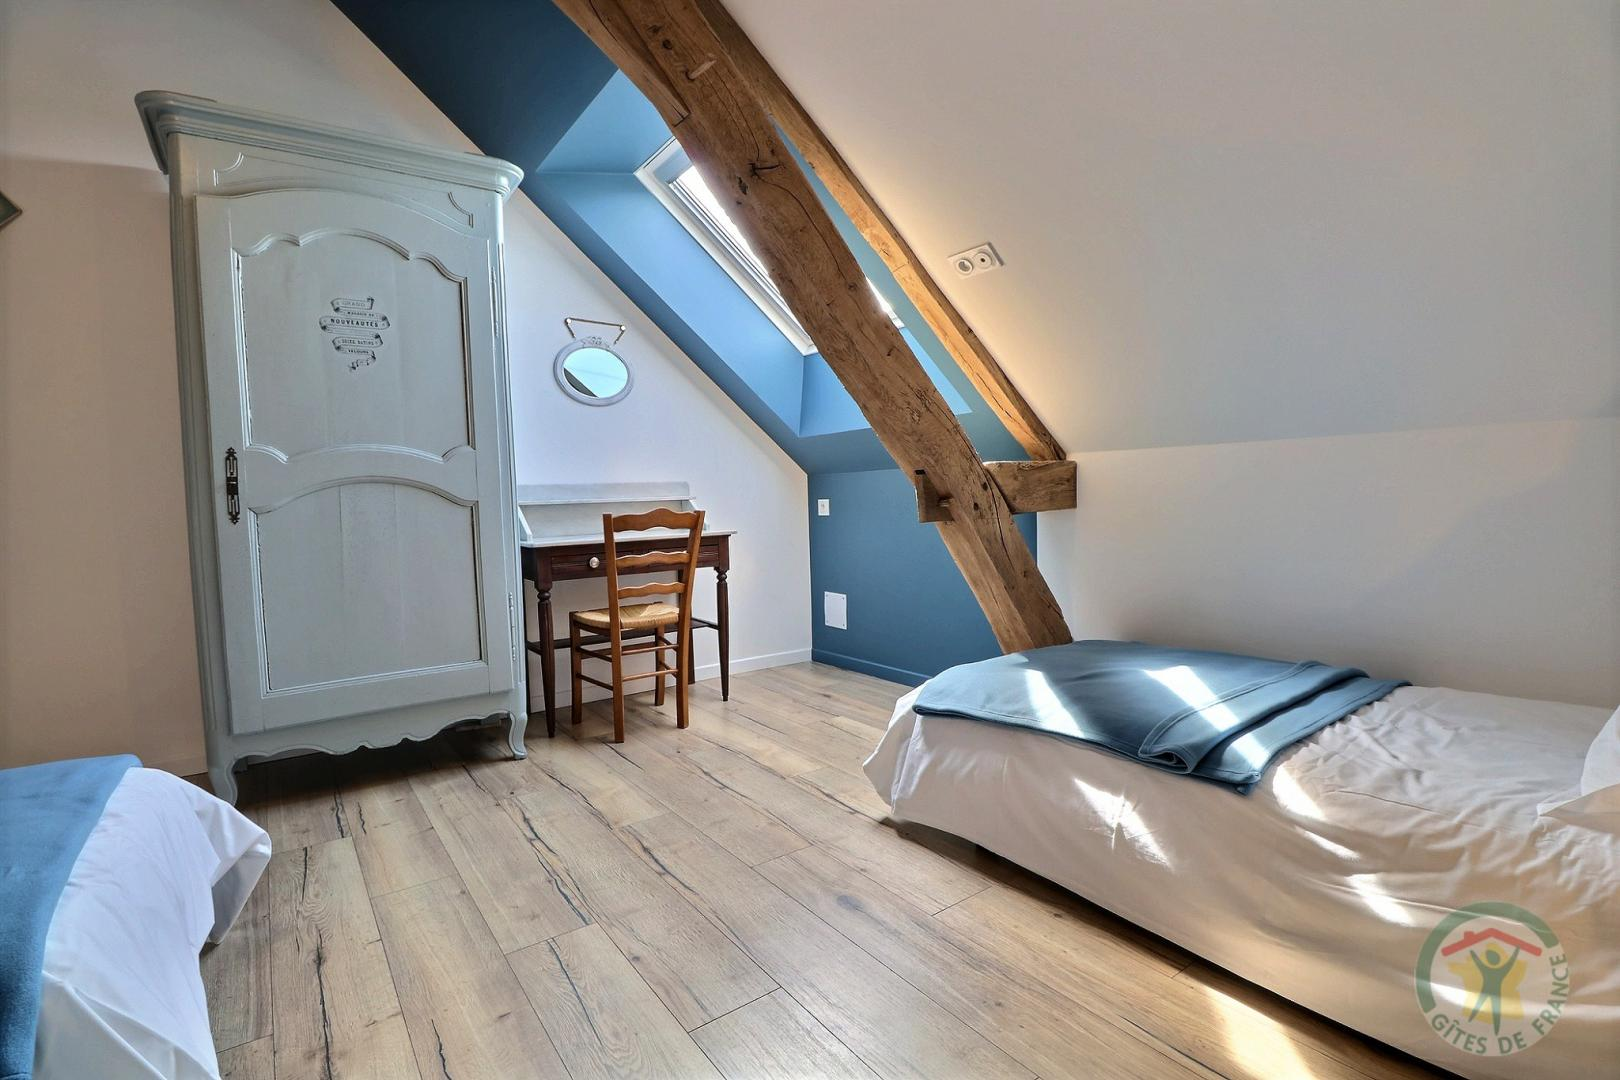 Gîte au bois charmant (5eme Chambre Etage)